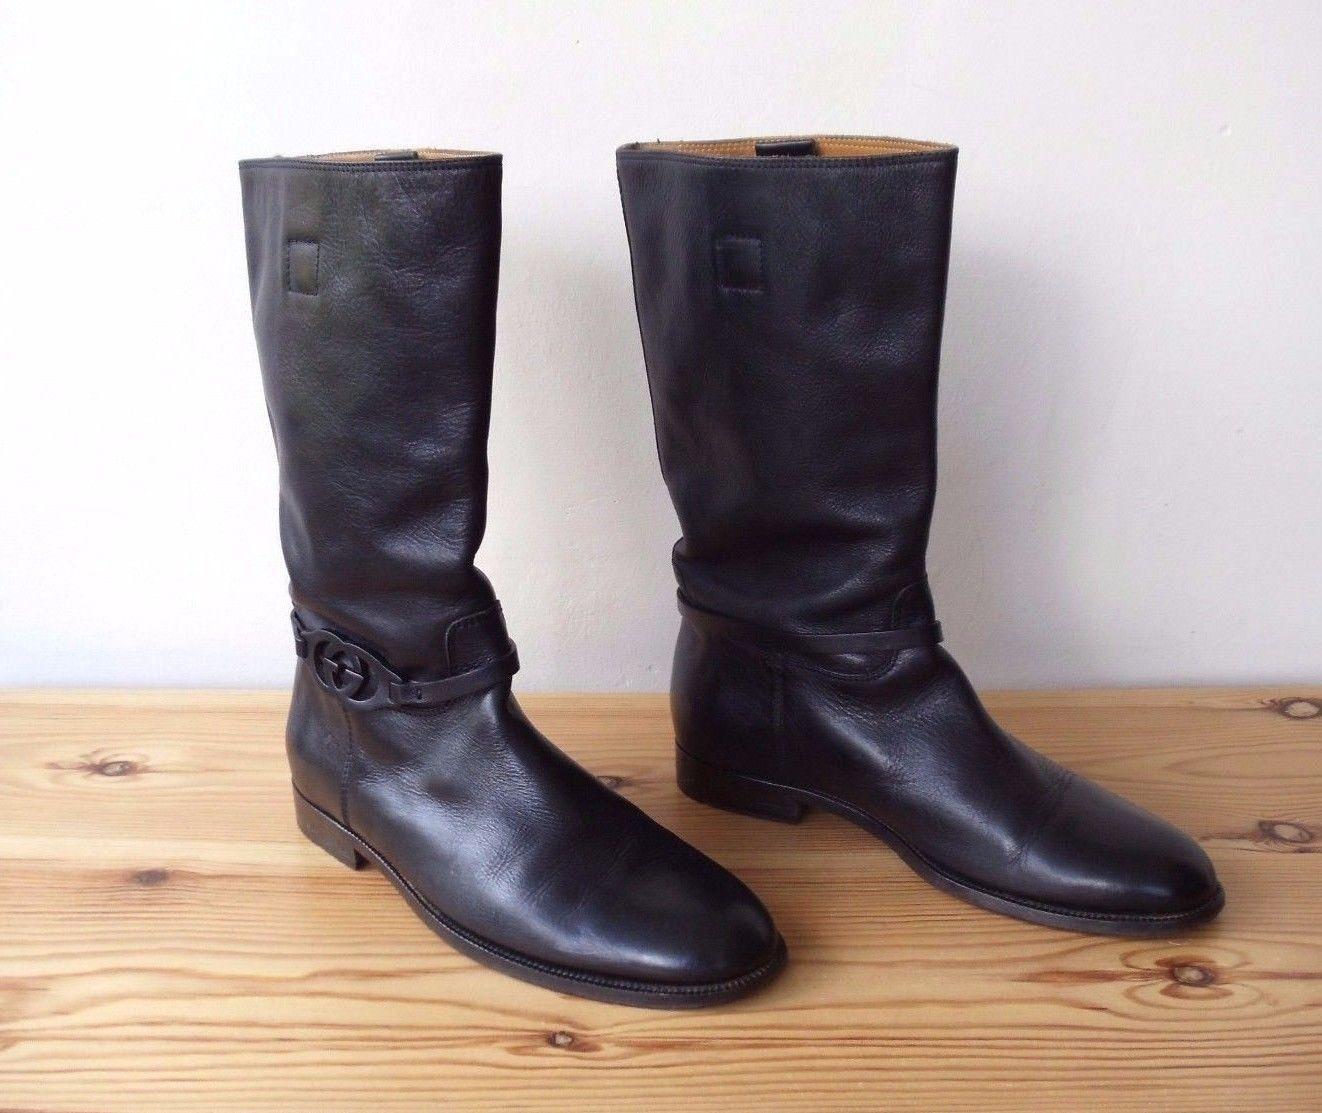 d923efa63 Rare Men's Gucci Black Leather Tall Riding Boots UK 9.5 EU 43.5 US 10.5 RRP  Â850